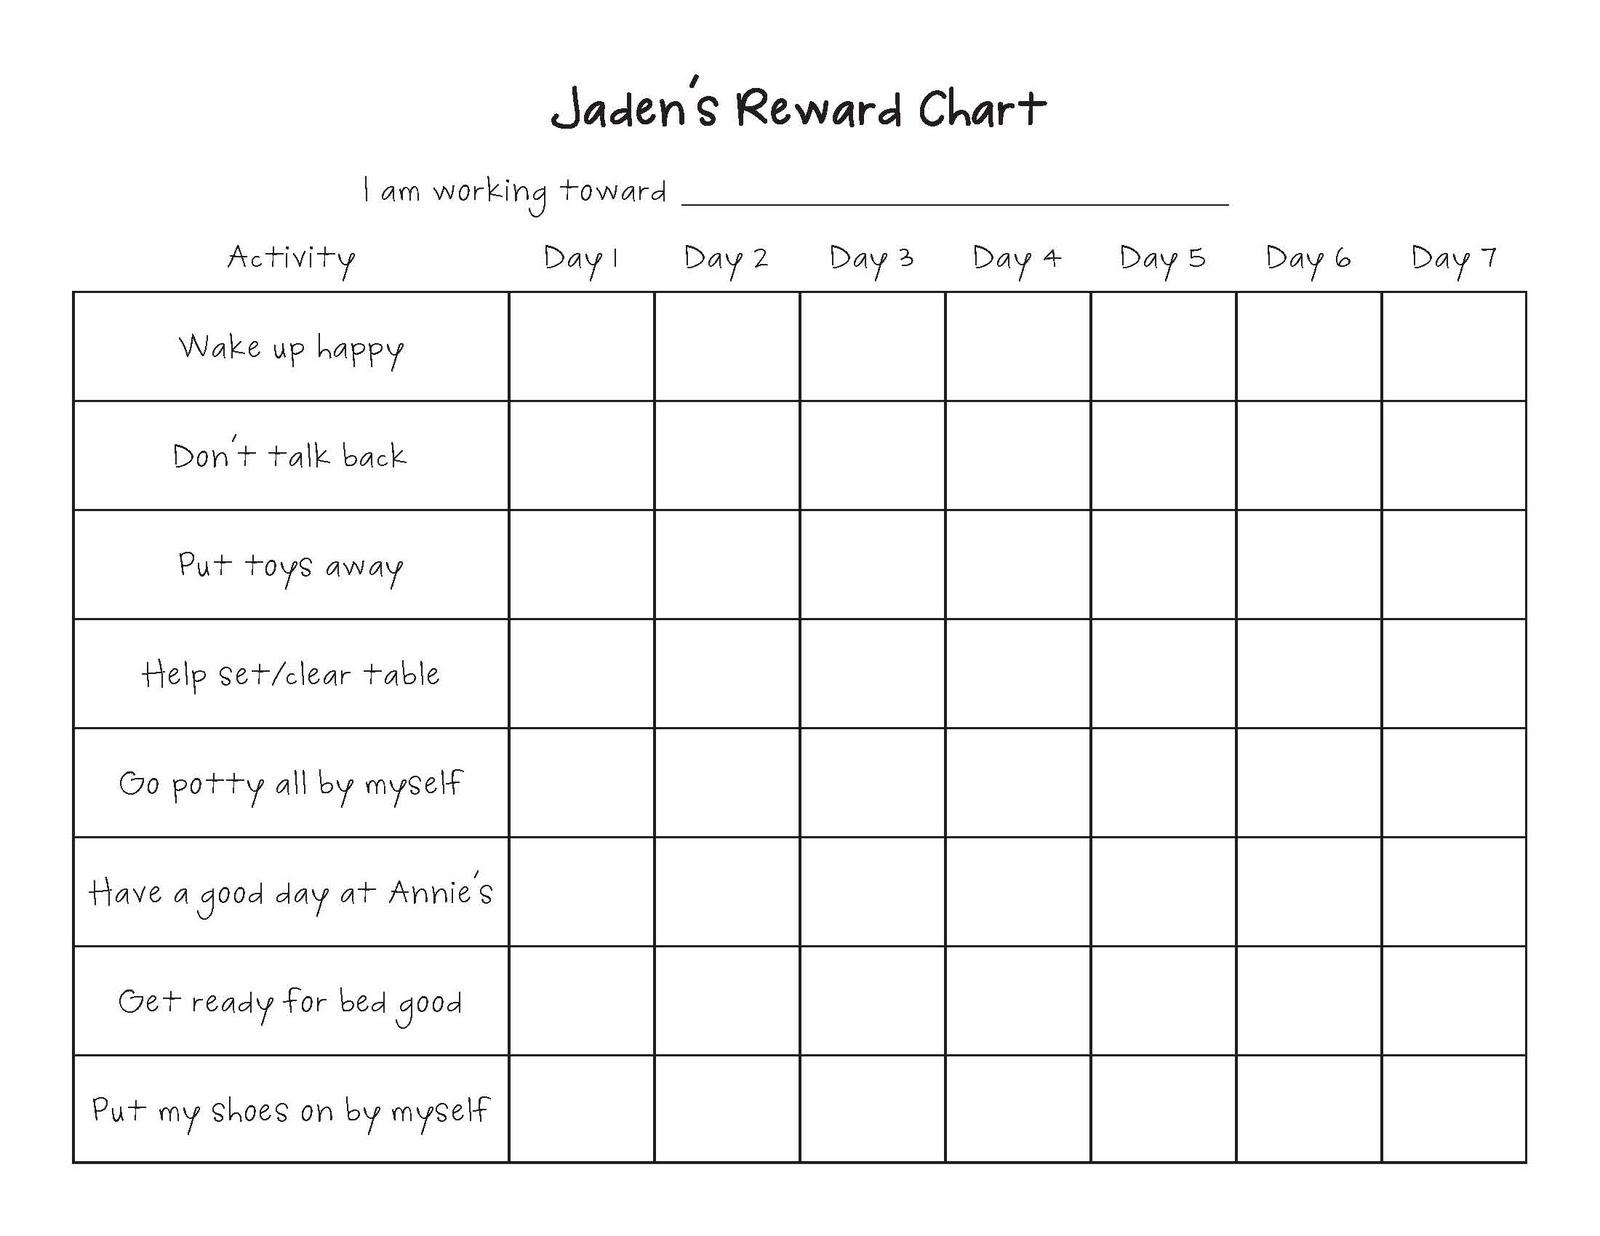 Living My Life On Purpose Reward Chart Update